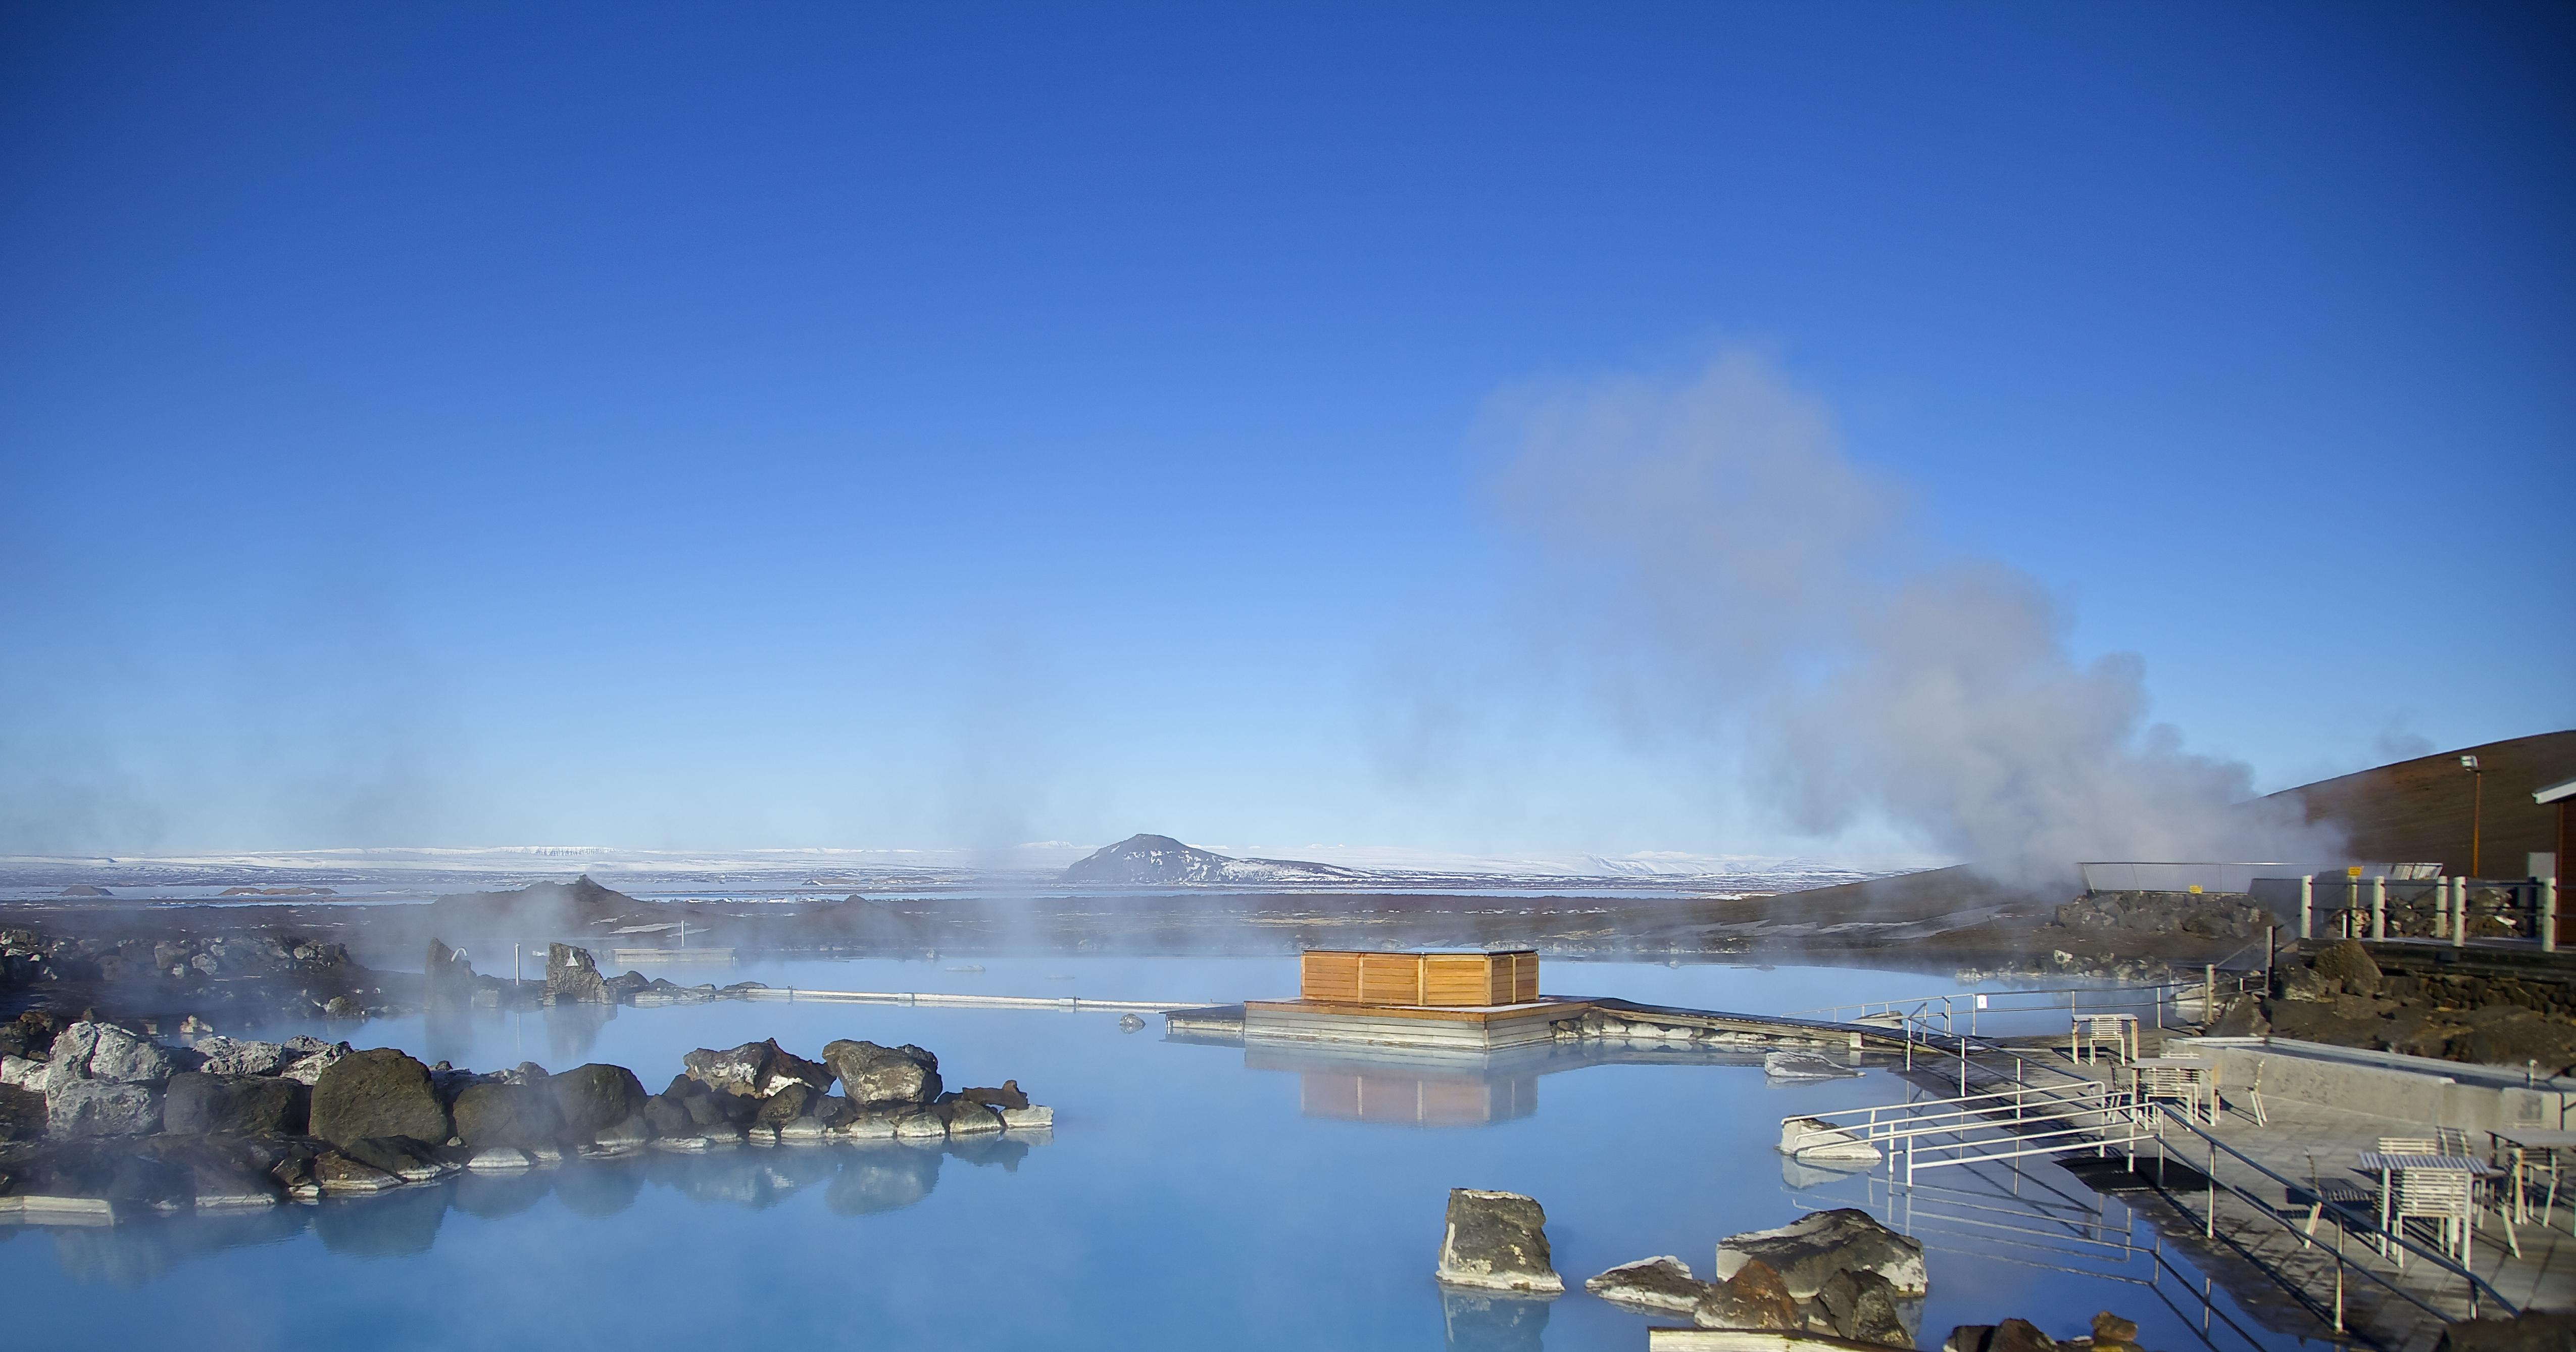 Теплые лазурные воды купален Миватн манят